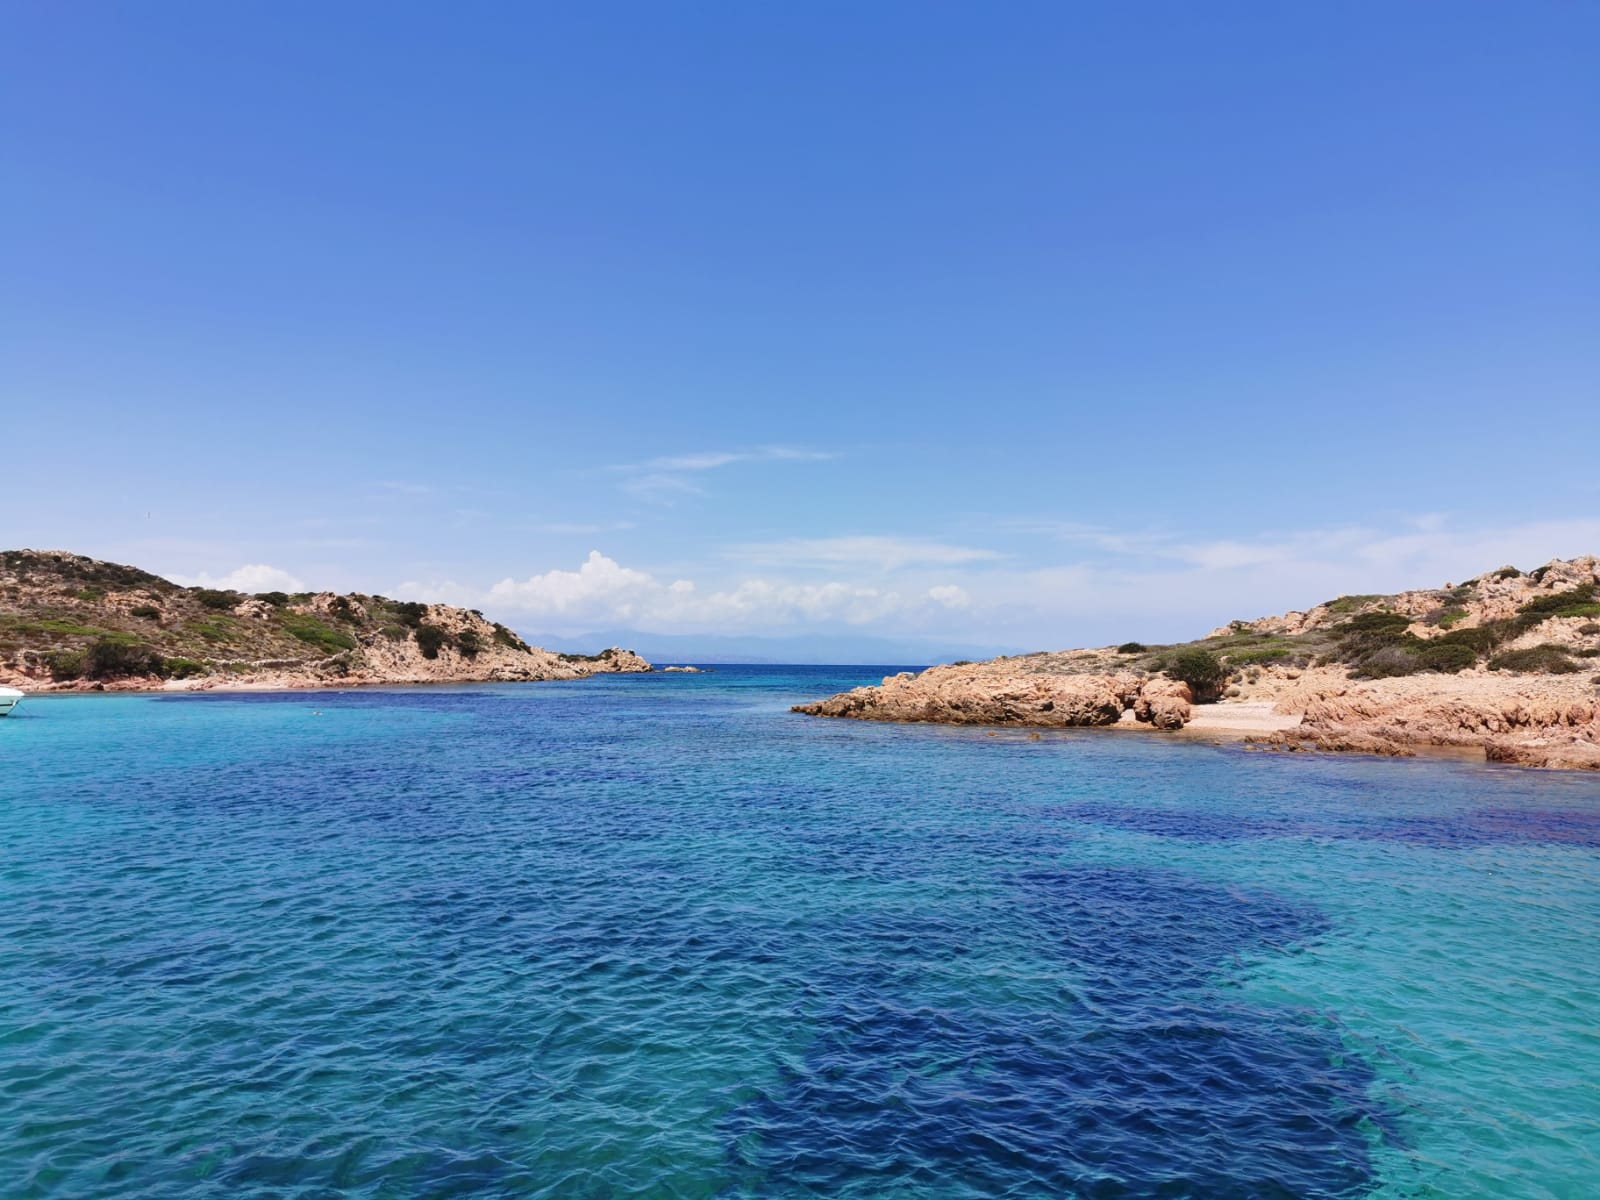 arcipelago_la_maddalena